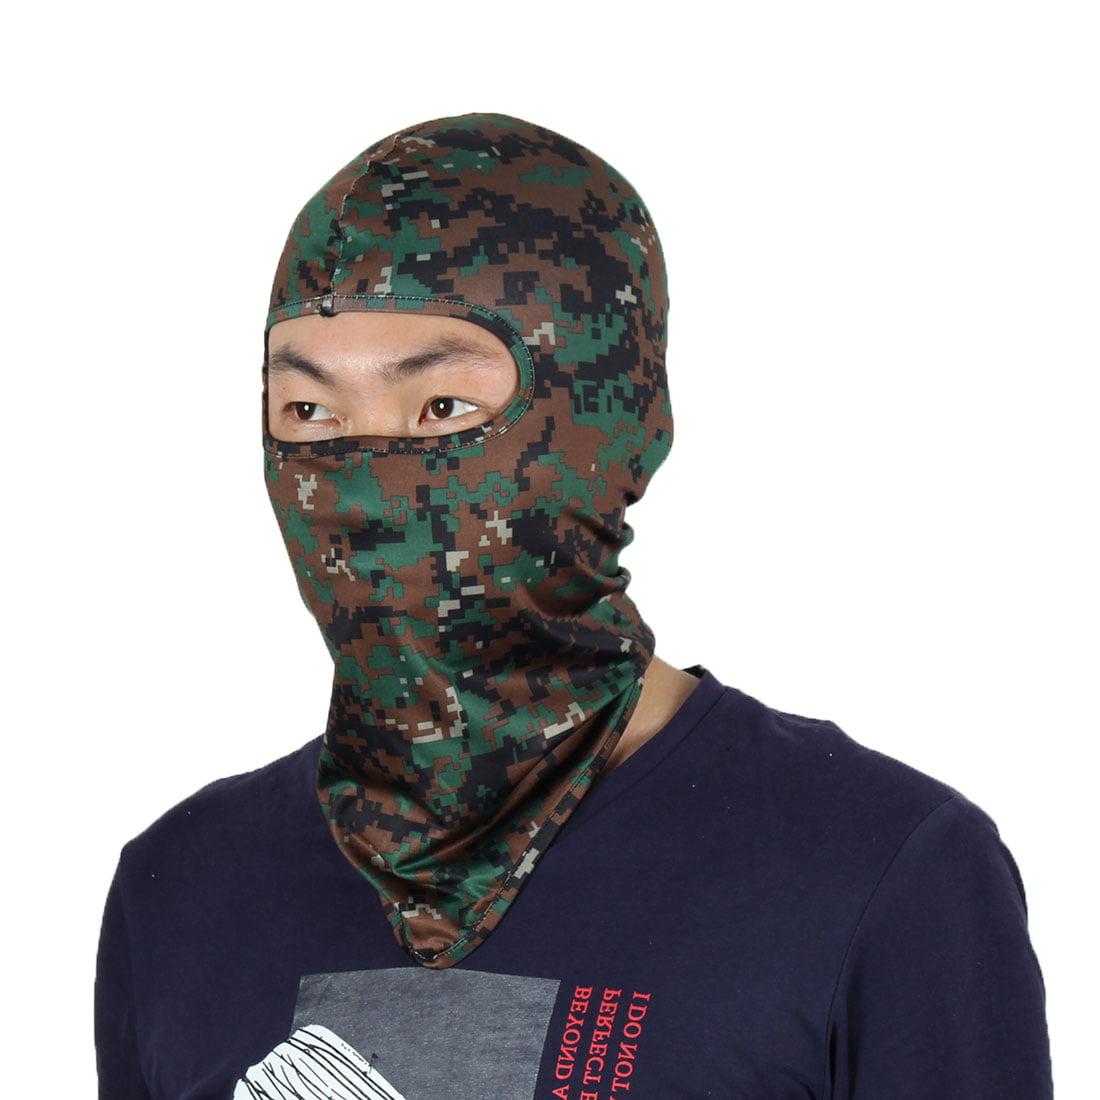 20d53b6e57d Full Coverage Face Mask Gel Padded Neck Protector Beanie Hood Helmet  Balaclava